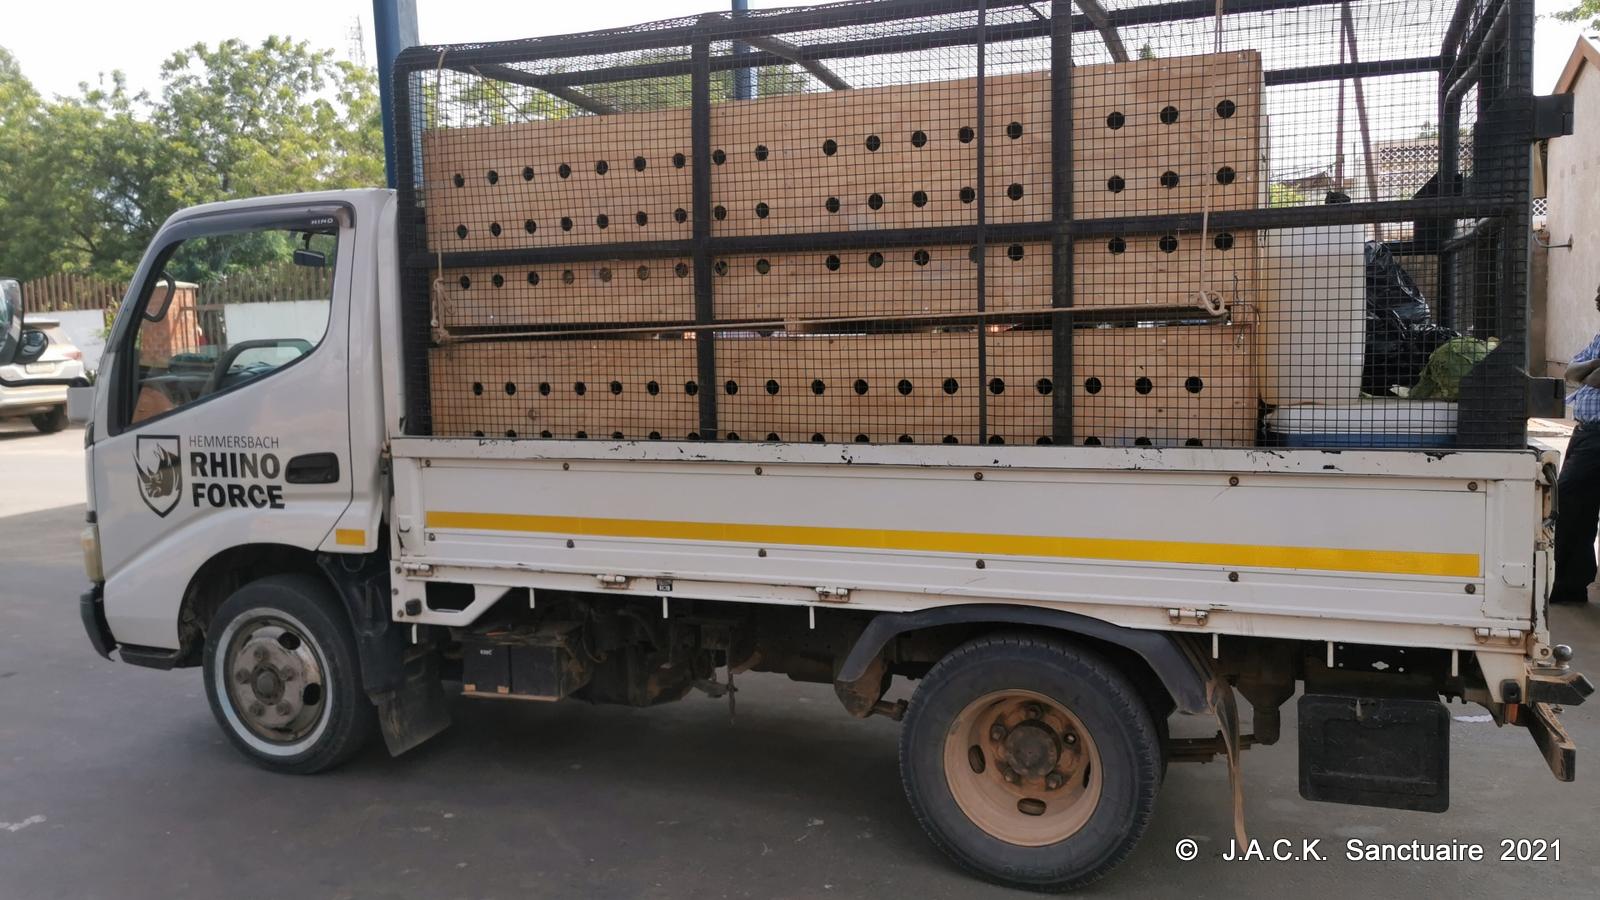 DRC monkeys seized in Zimbabwe – ongoing repatriation!